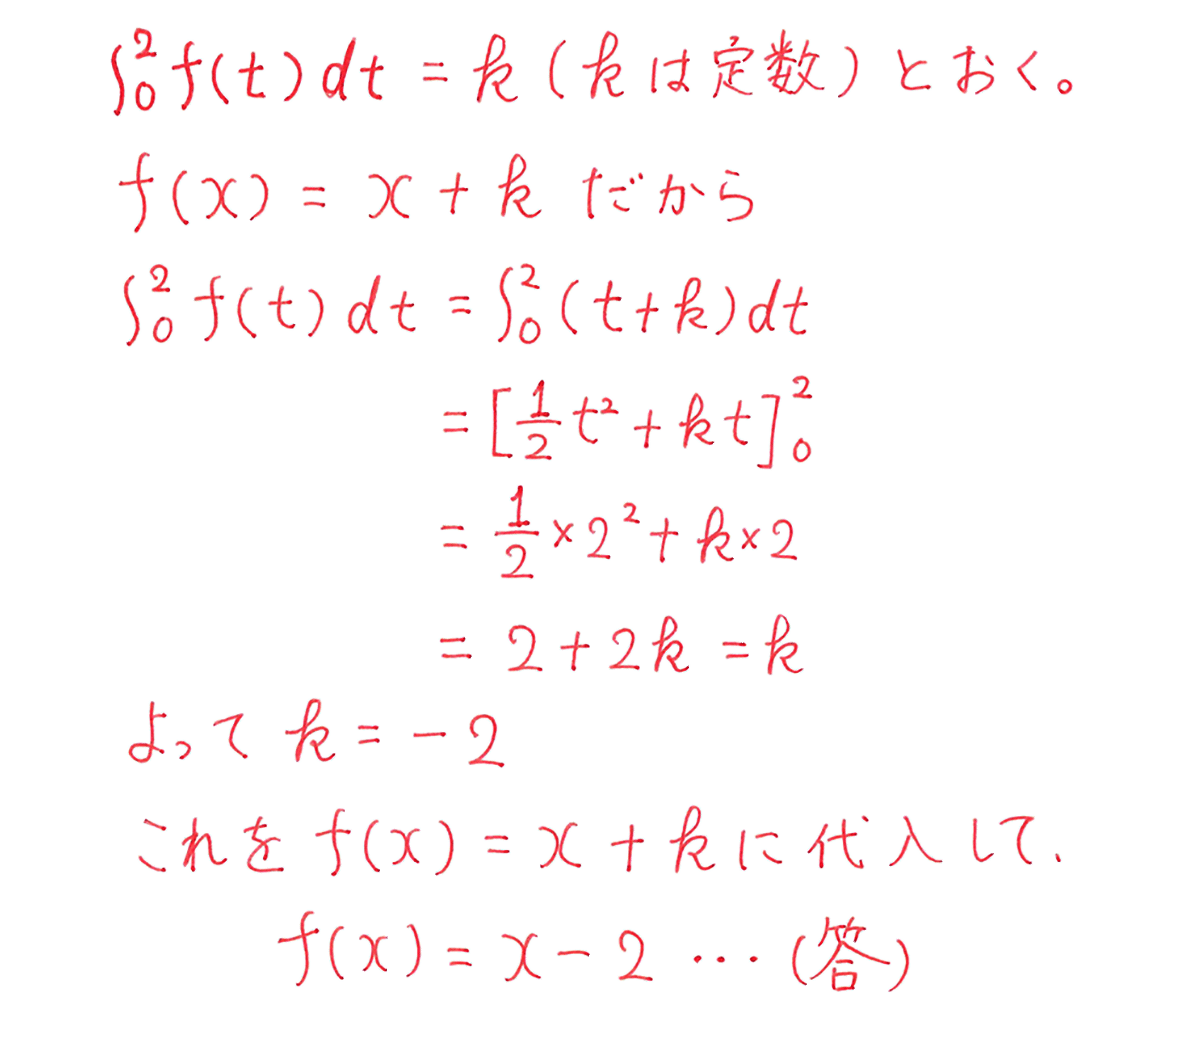 高校数学Ⅱ 微分法と積分法31 例題 答え